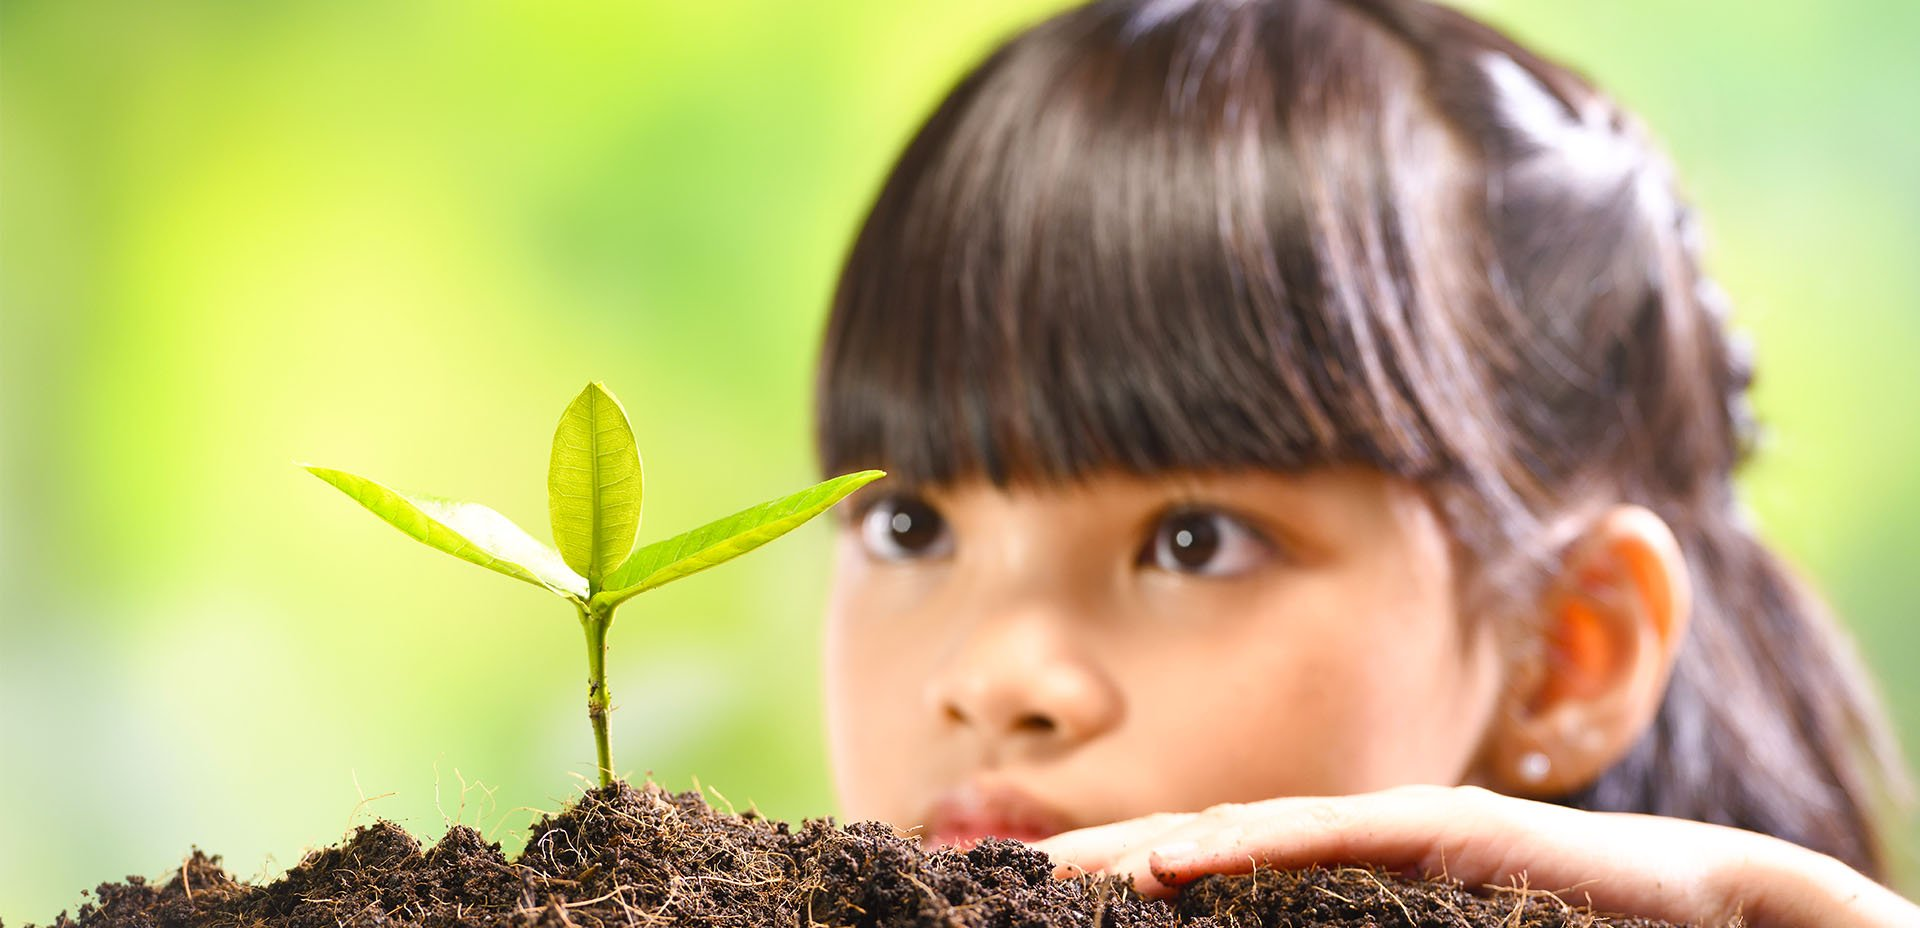 bambina osserva una pianta